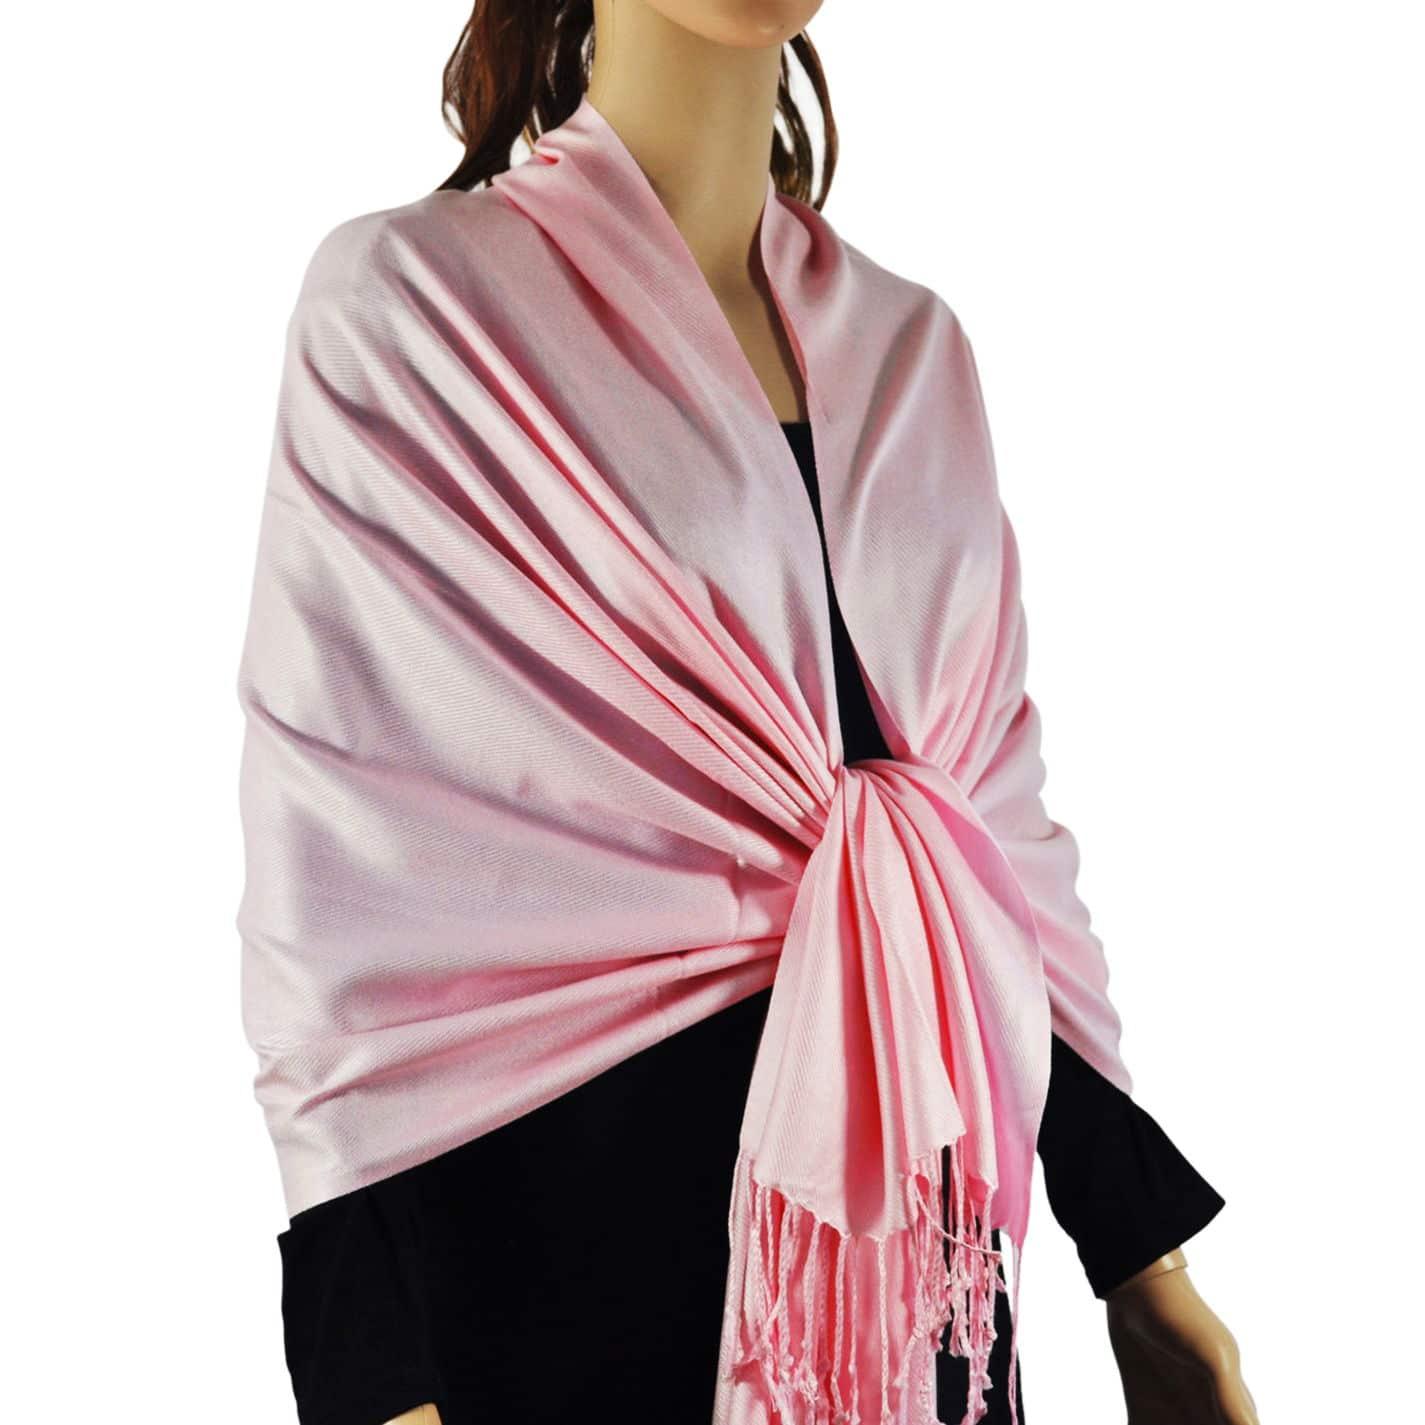 Solid Silky Wedding Pashmina Light Pink